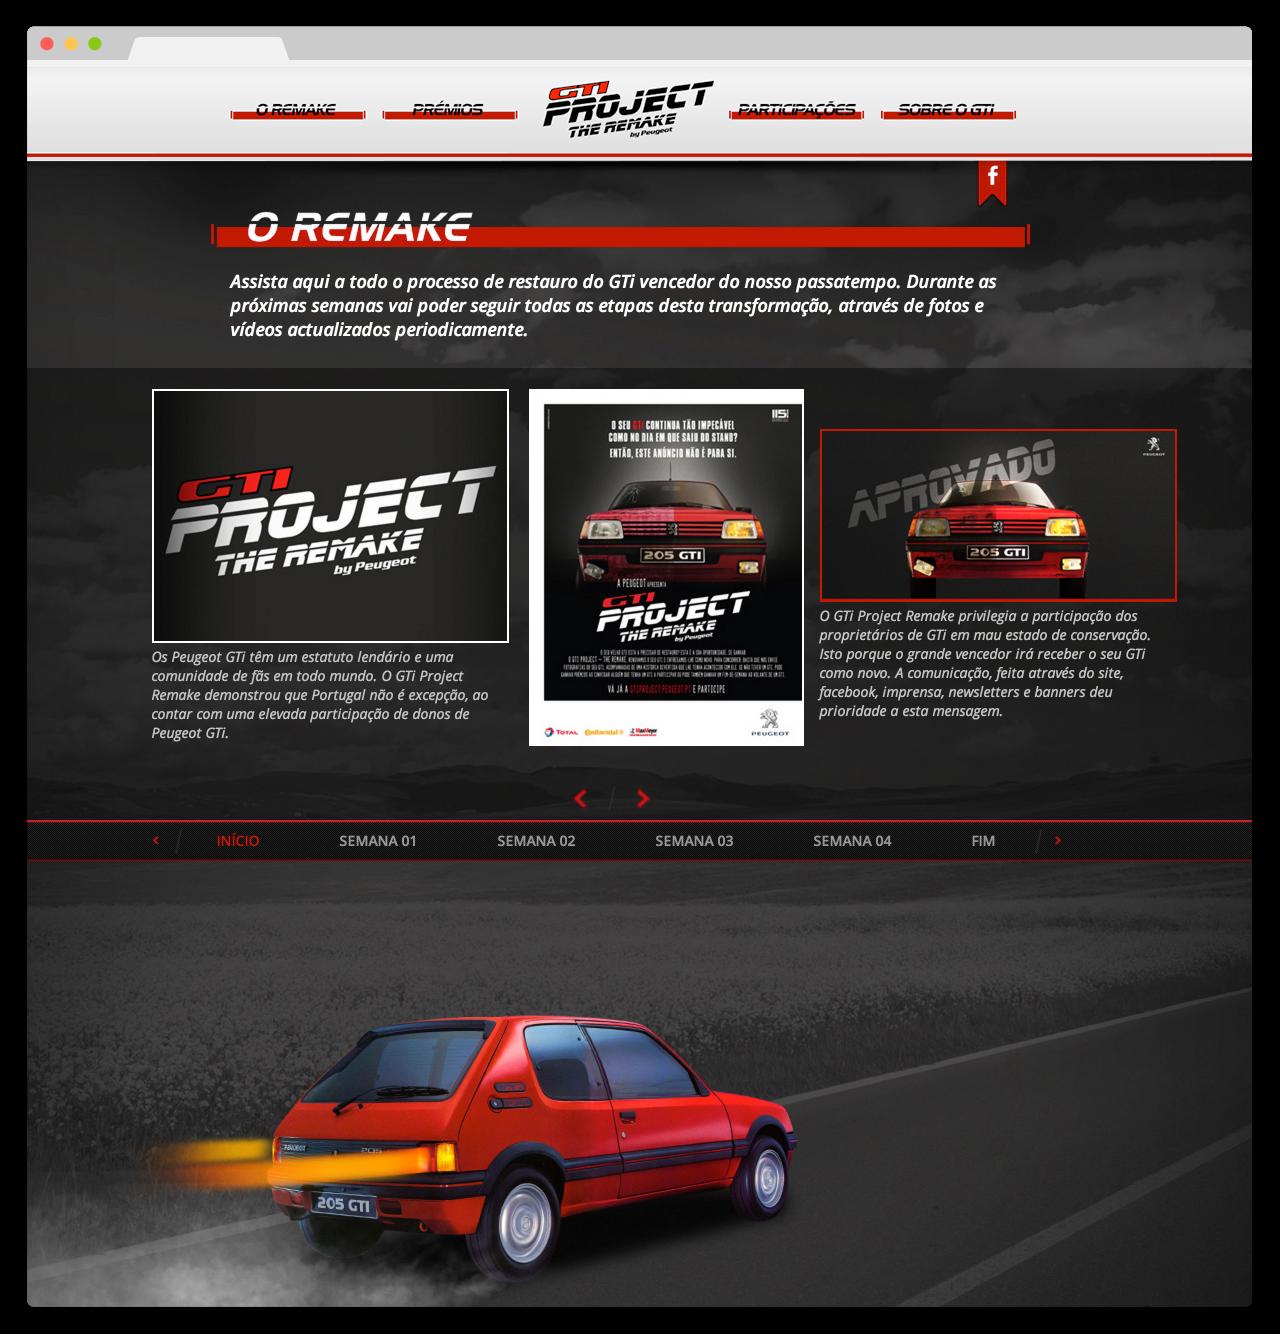 Pedro Gaspar - GTi Project